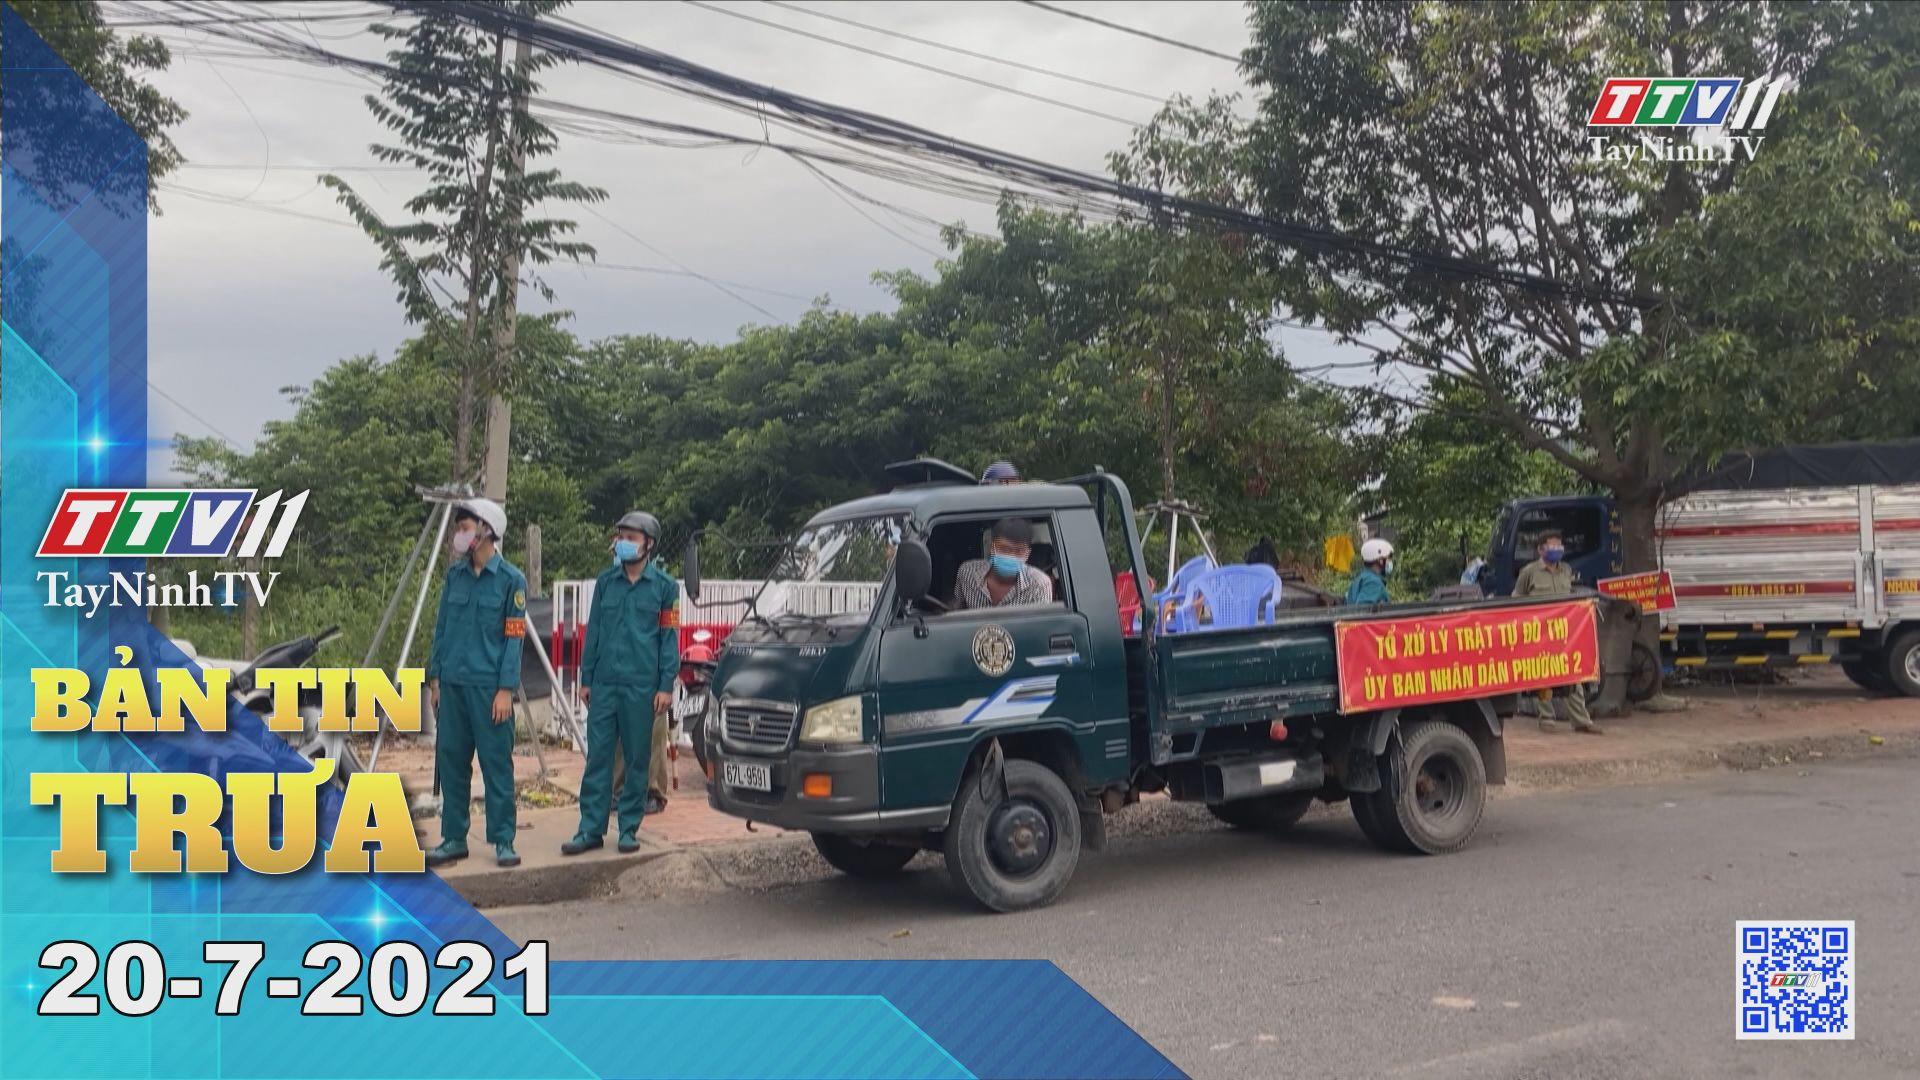 Bản tin trưa 20-7-2021 | Tin tức hôm nay | TayNinhTV